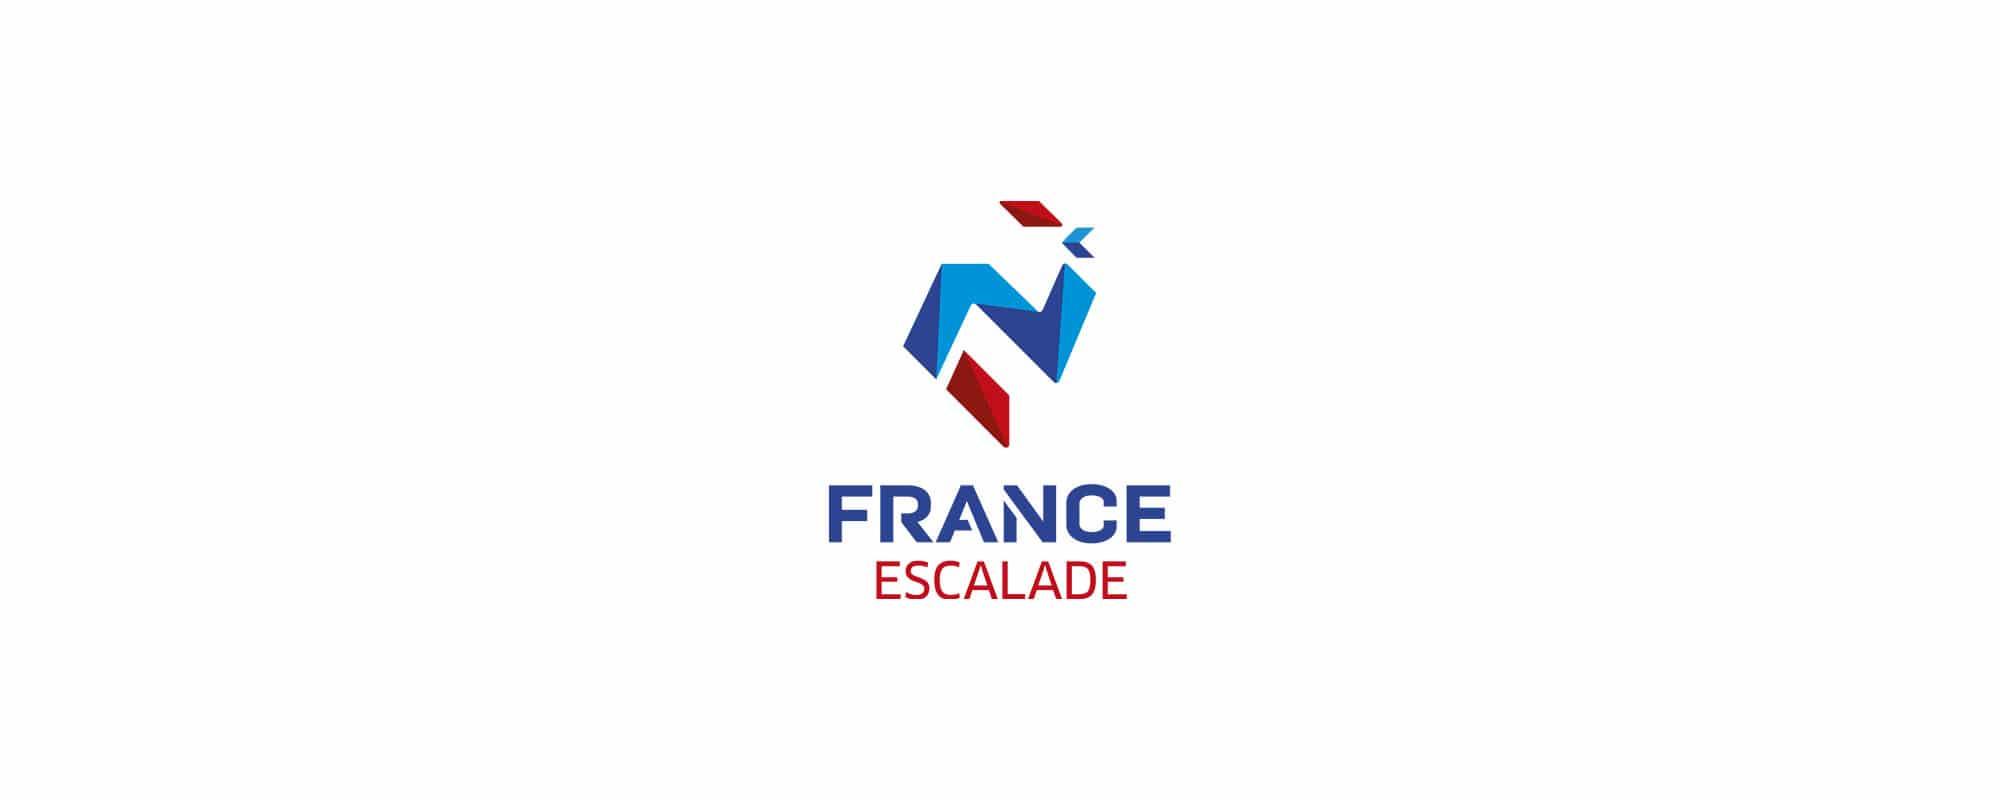 Epreuves sélectives – Equipes de France de bloc – Mars 2021